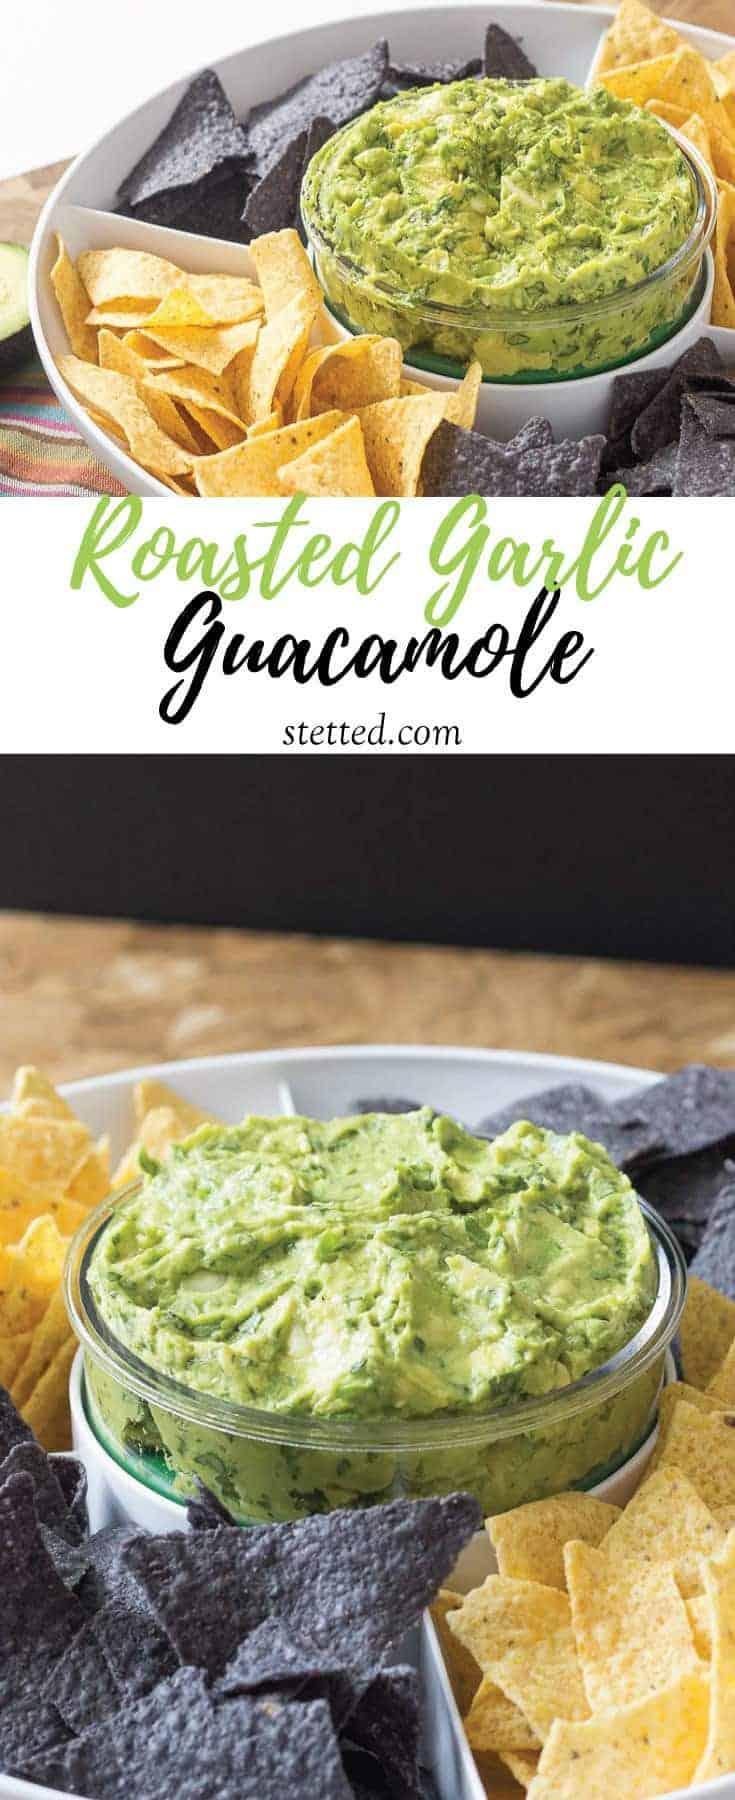 Roasted garlic guacamole is my go-to guacamole recipe! Why wait for Cinco de Mayo?